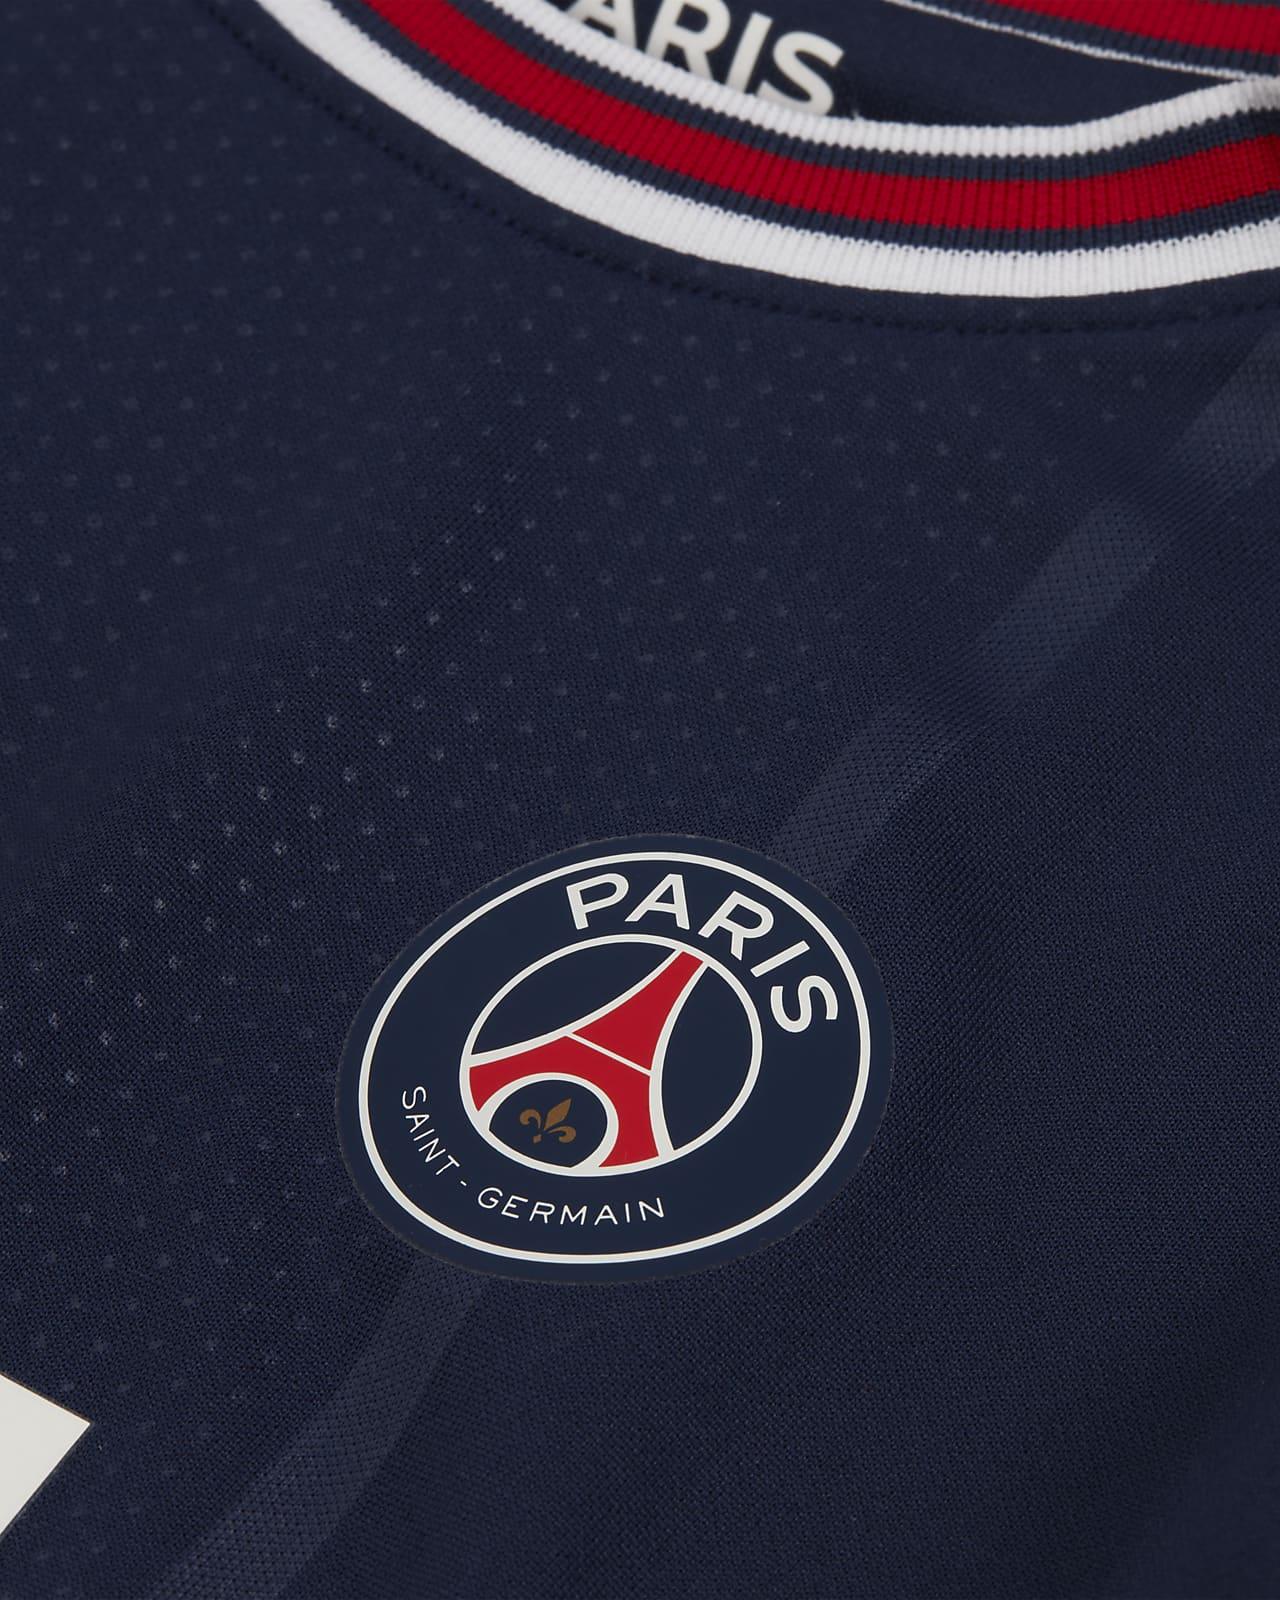 Divisa da calcio Paris Saint-Germain 2021/22 per neonati/bimbi piccoli - Home